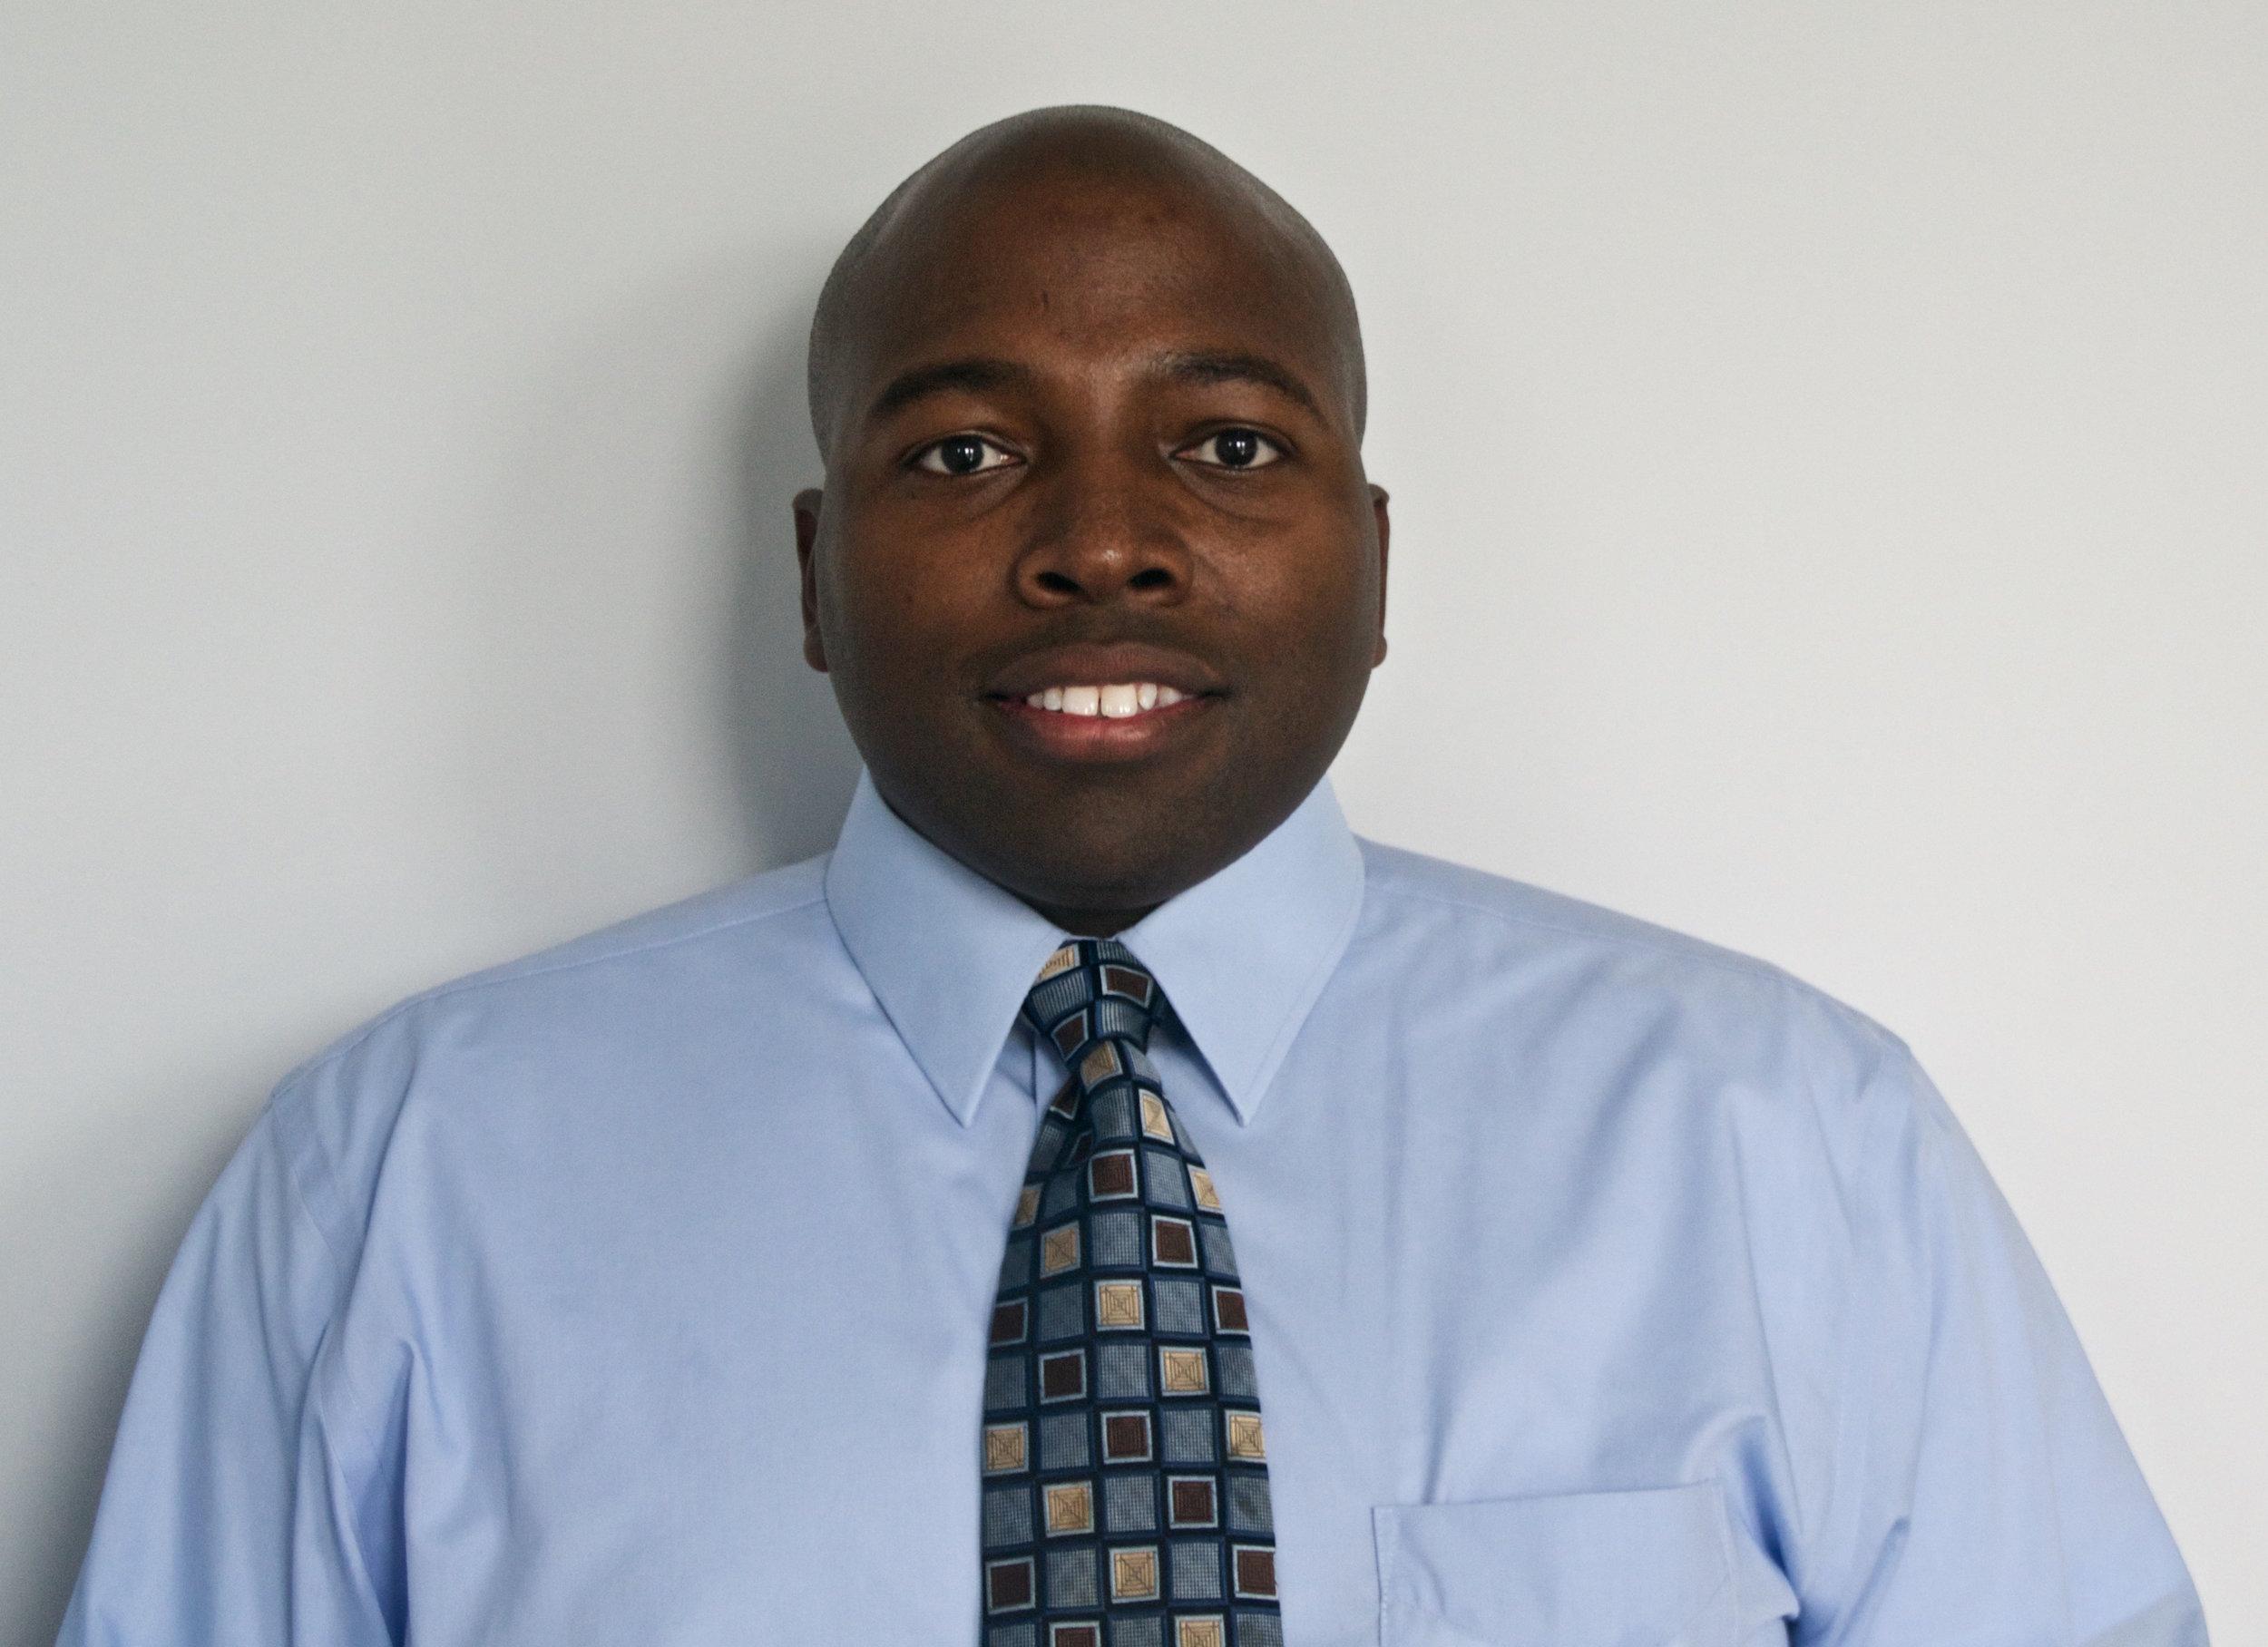 Dwayne Keys,  Financial Coaching Associate